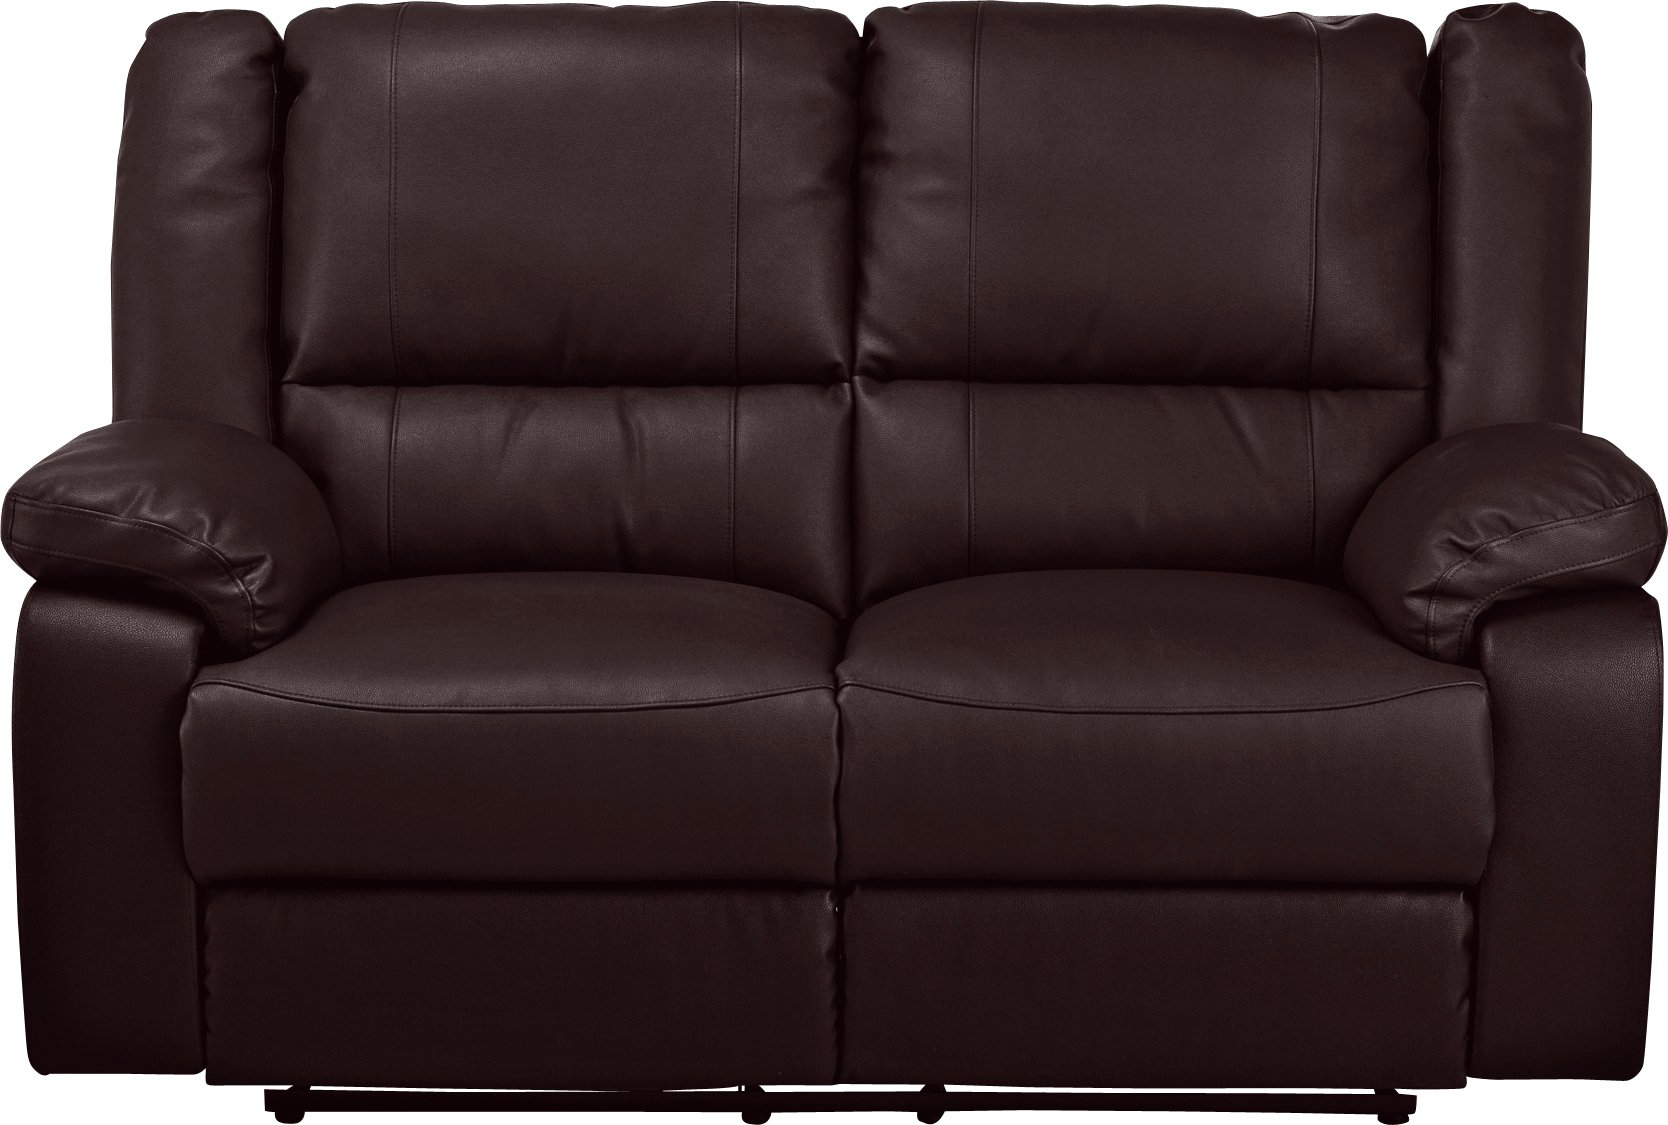 Argos Home Bruno 2 Seater Manual Recliner Sofa - Black